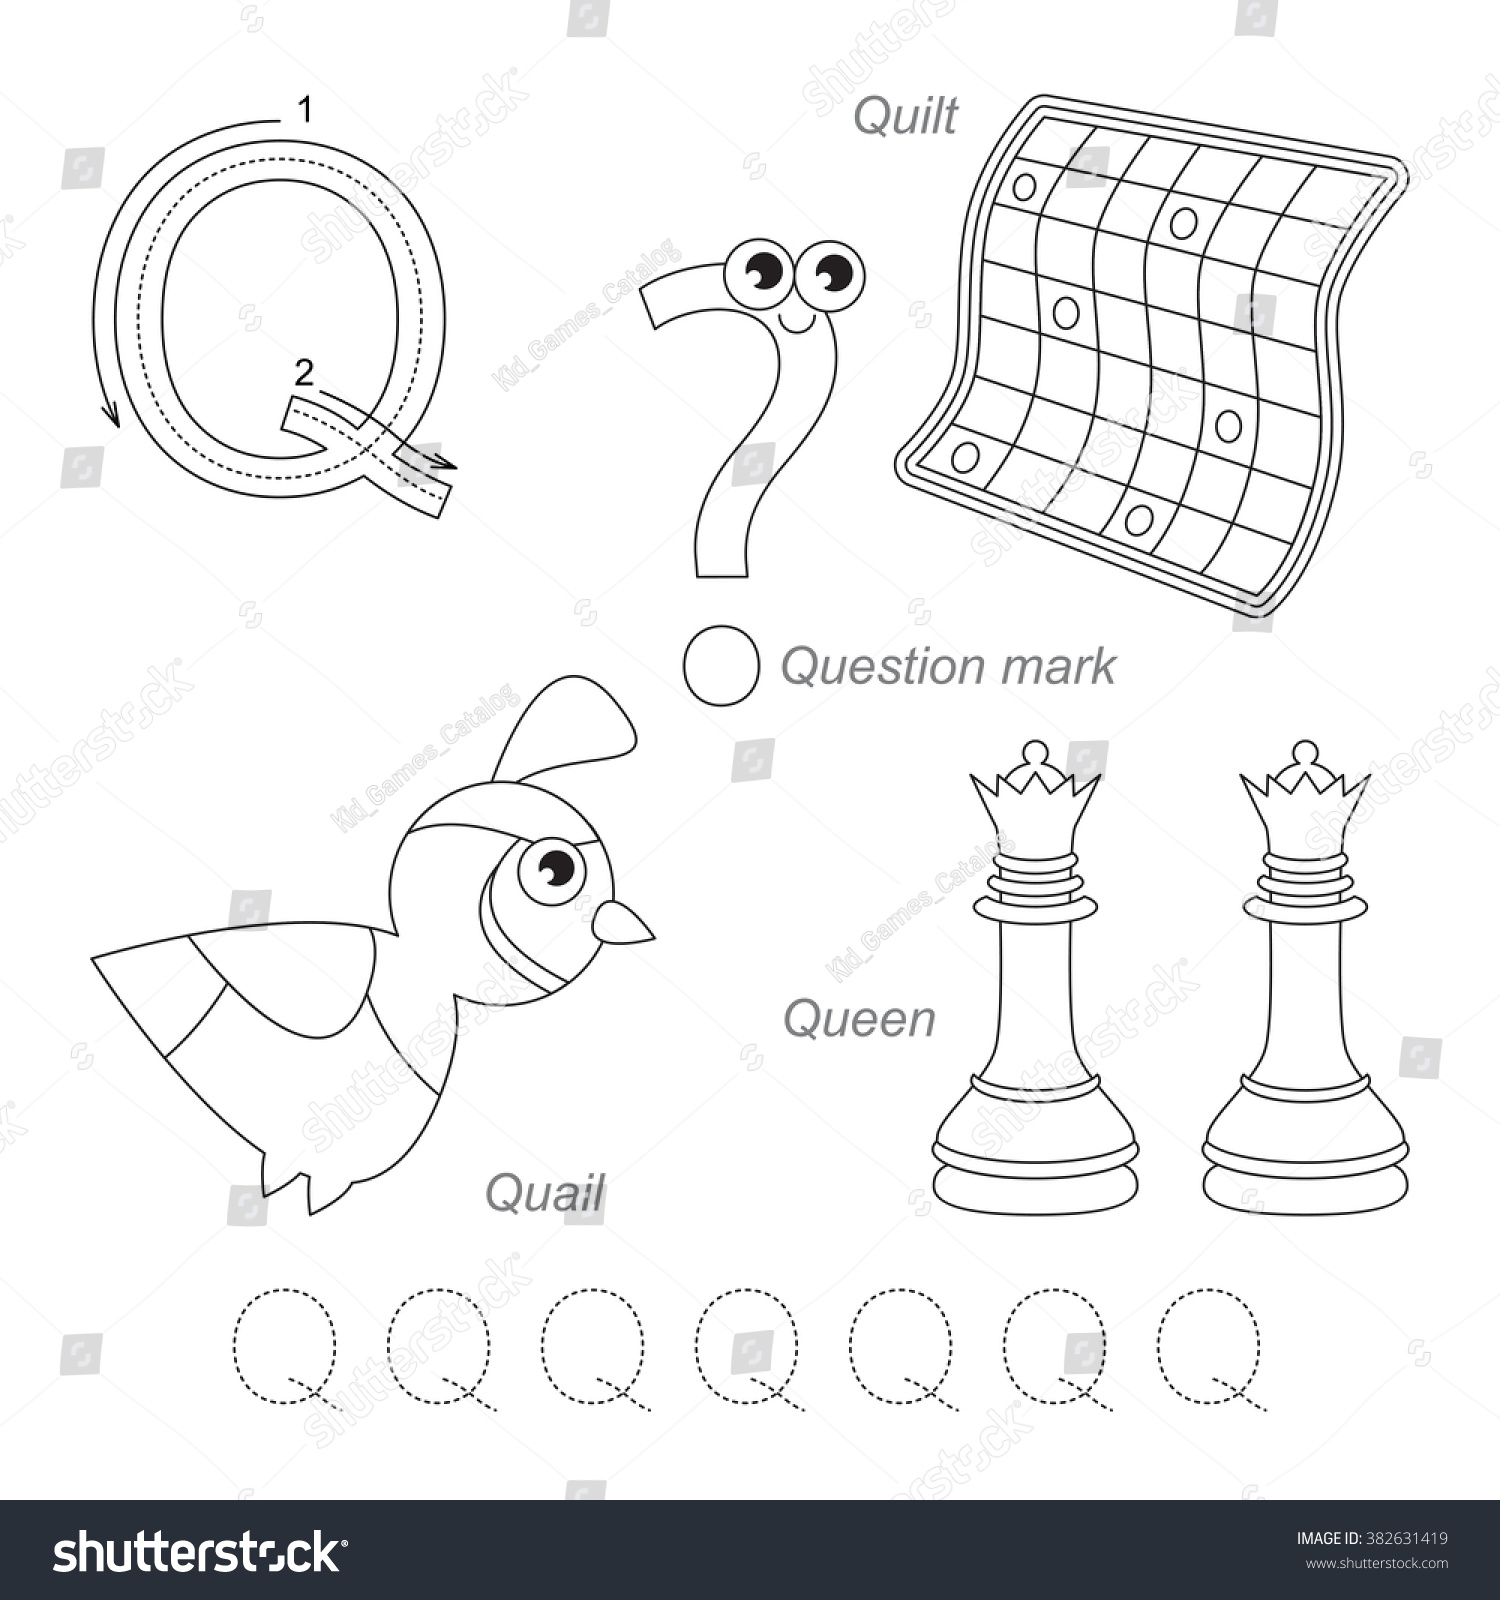 Tracing Worksheet Children Full English Alphabet Stock Vector